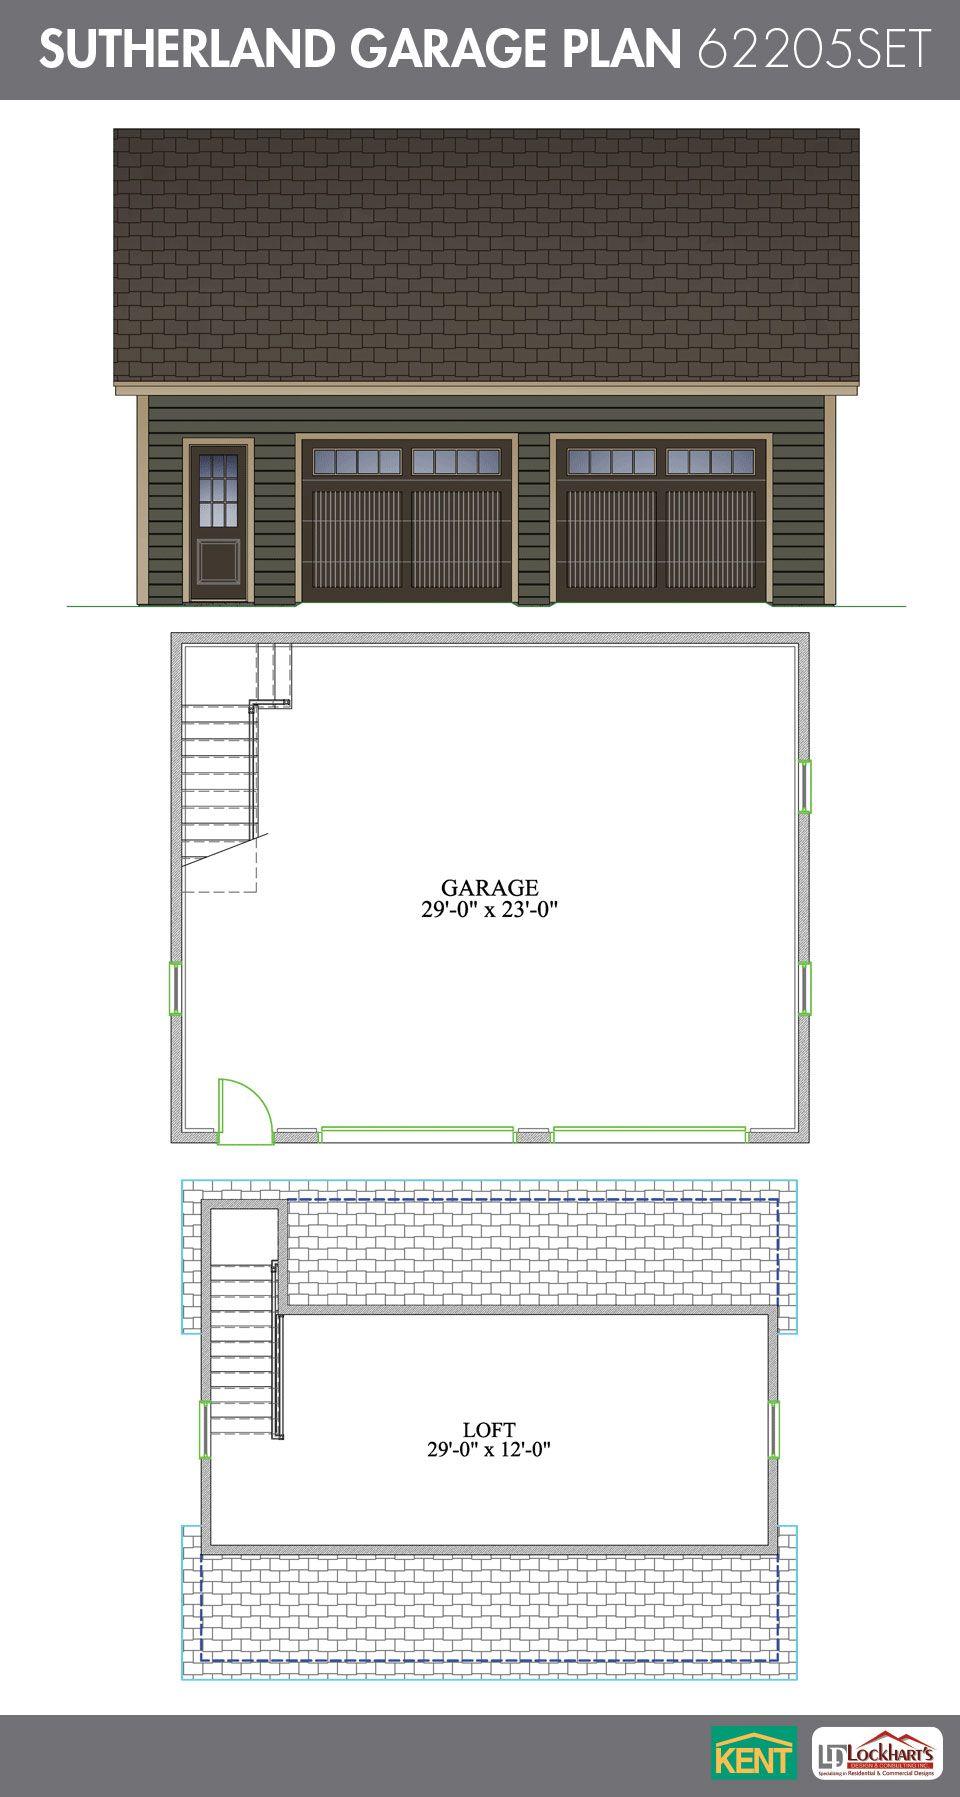 Sutherland Garage Plan Kent Building Supplies Garage Plan Garage Plans Kent Building